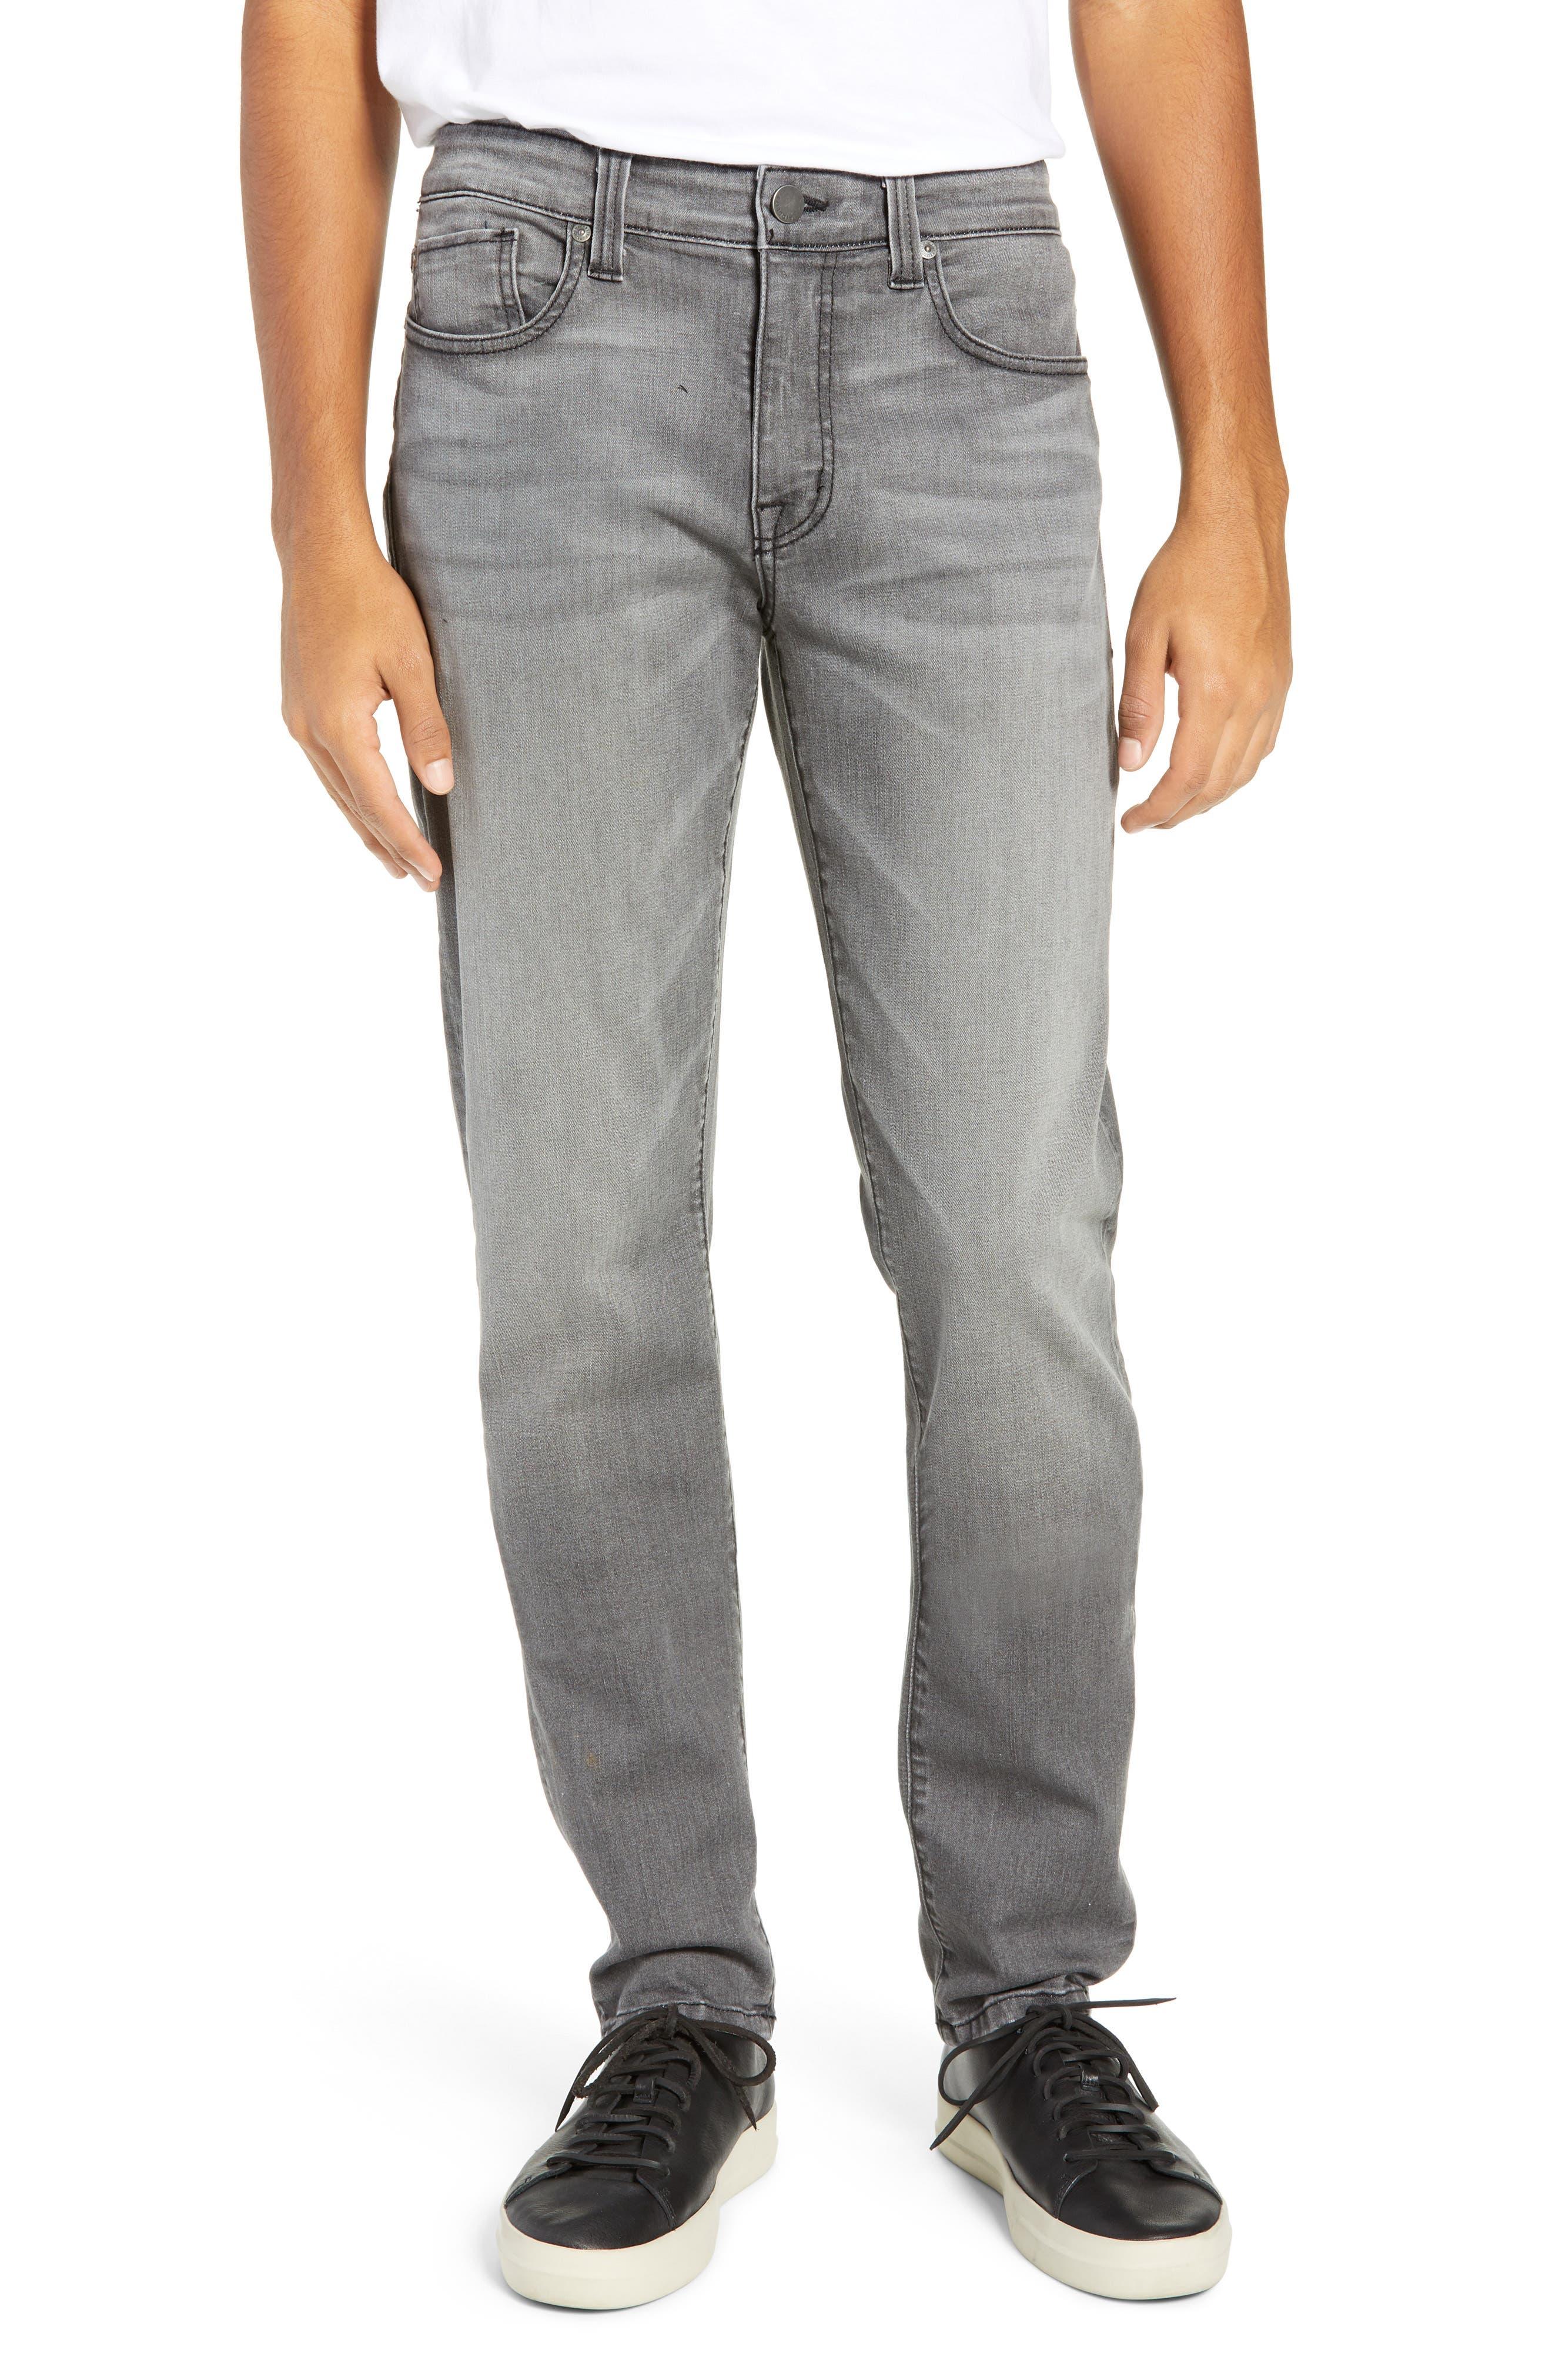 Torino Slim Fit Jeans,                         Main,                         color, PHANTOM GREY